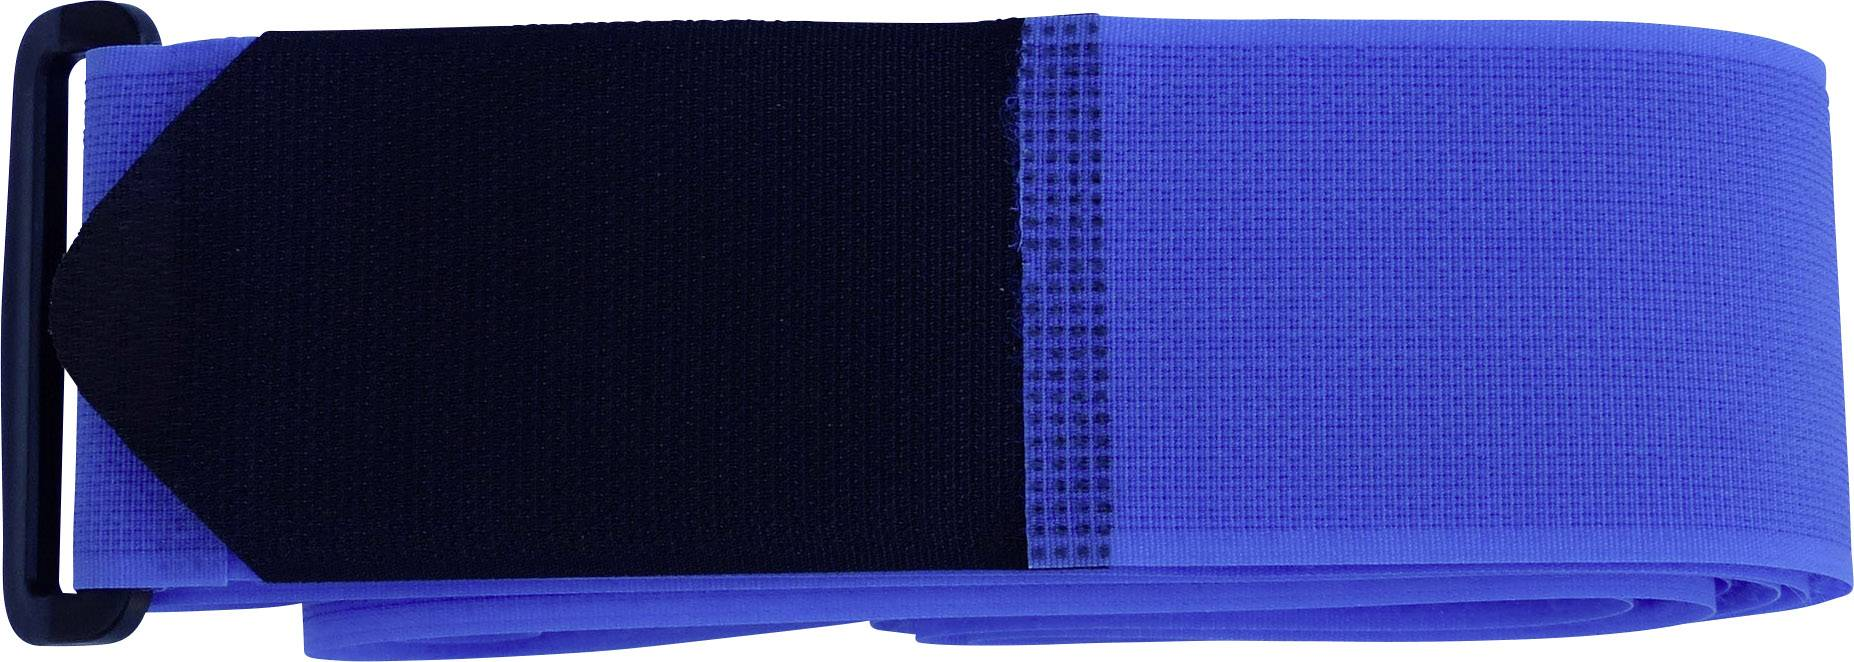 Pásik na kufor so suchým zipsom TRU COMPONENTS 922-0426-Bag, modrá, 1 ks